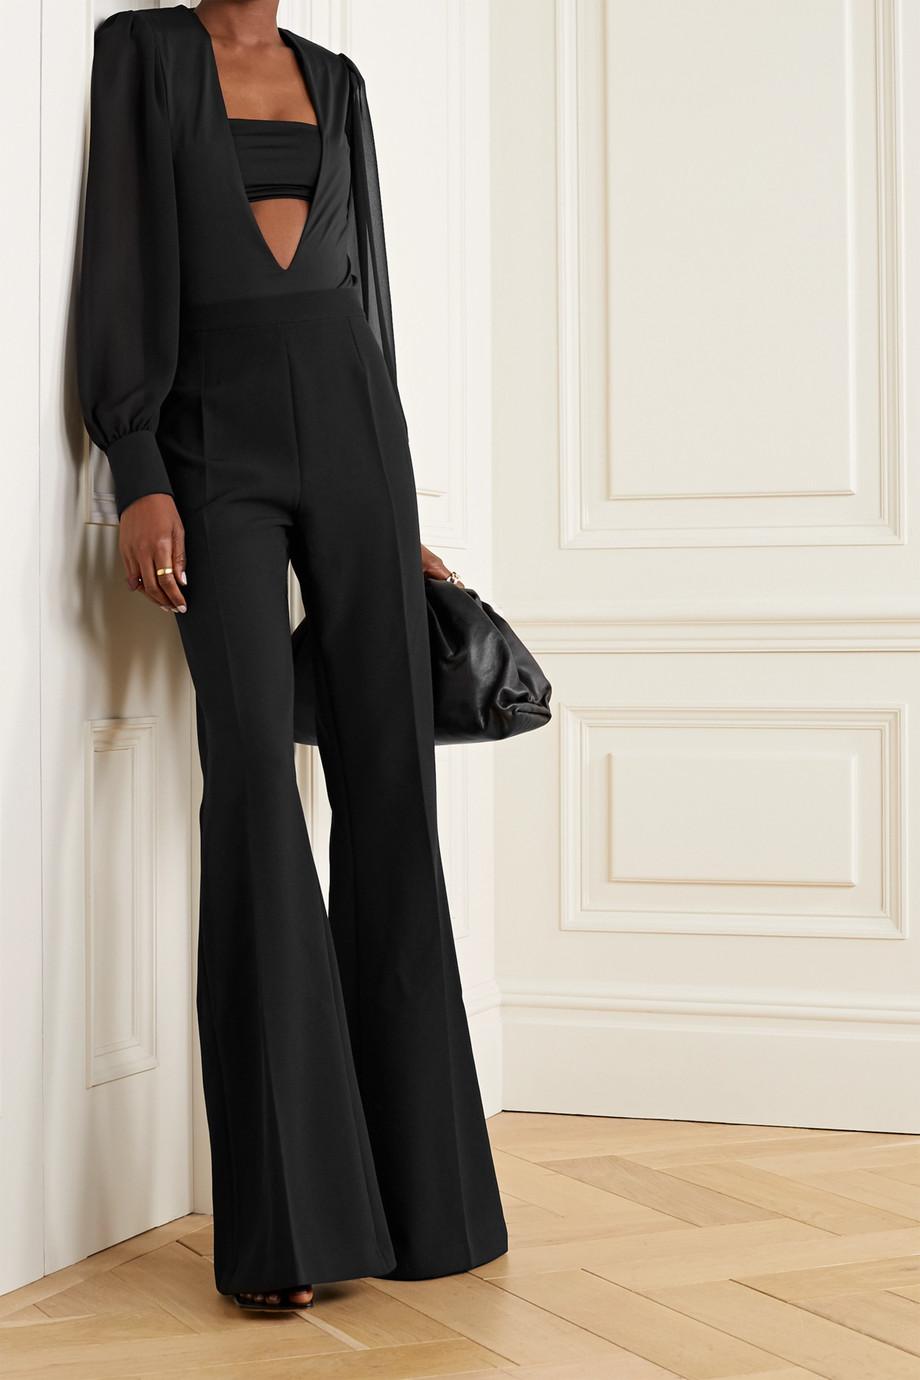 Marika Vera Hutton 分层式弹力平纹布雪纺绸连体丁字裤式紧身衣